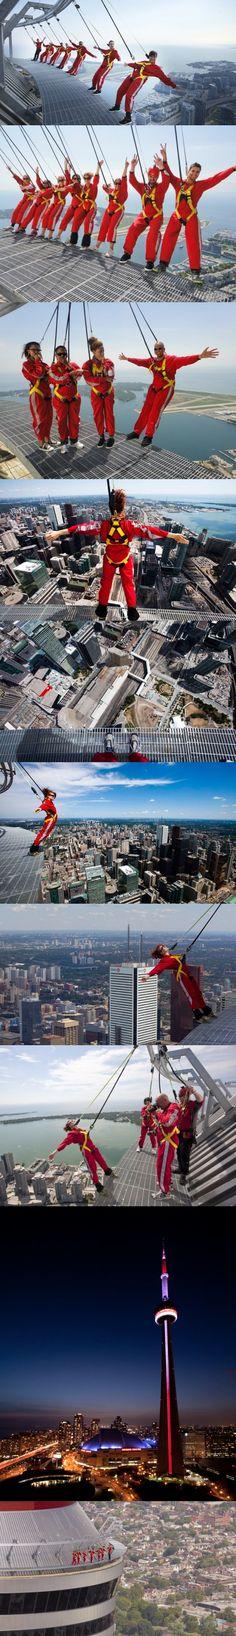 The Edge Walk in Toronto Canada Ailleurs communication, www.ailleurscommu…